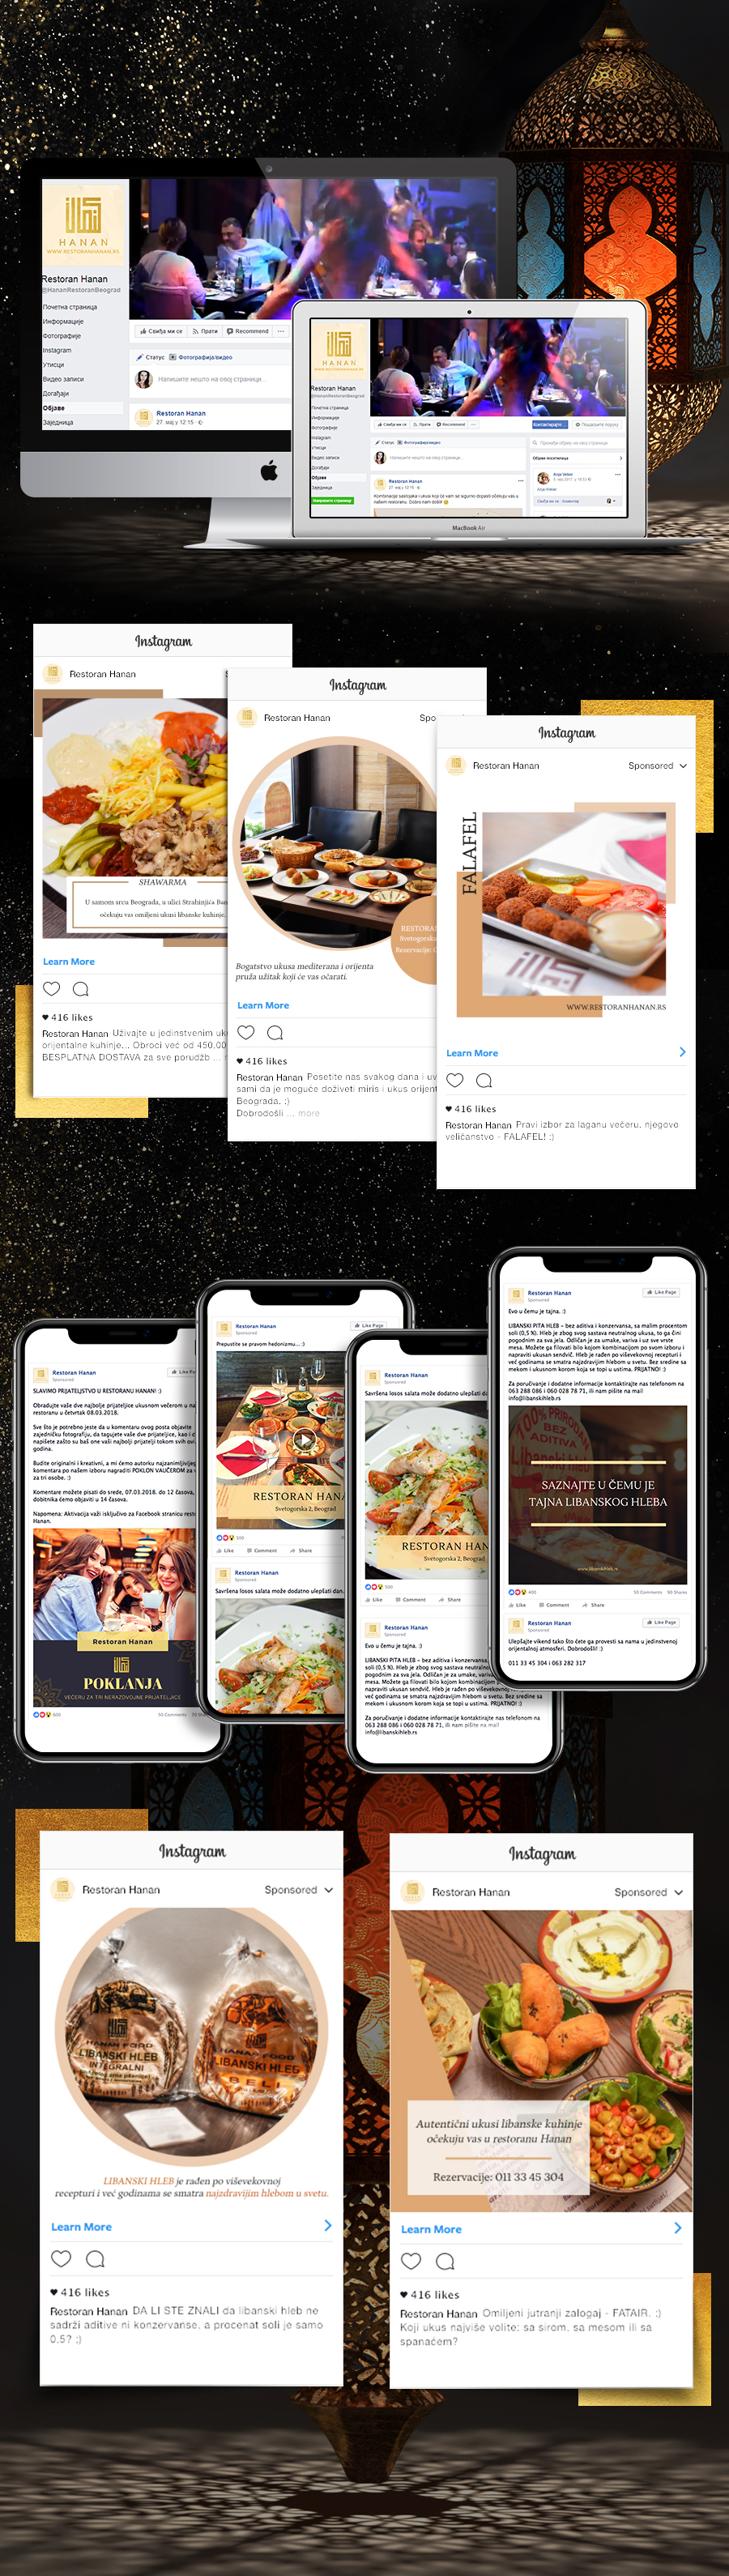 Restoran-Hanan-mock-up